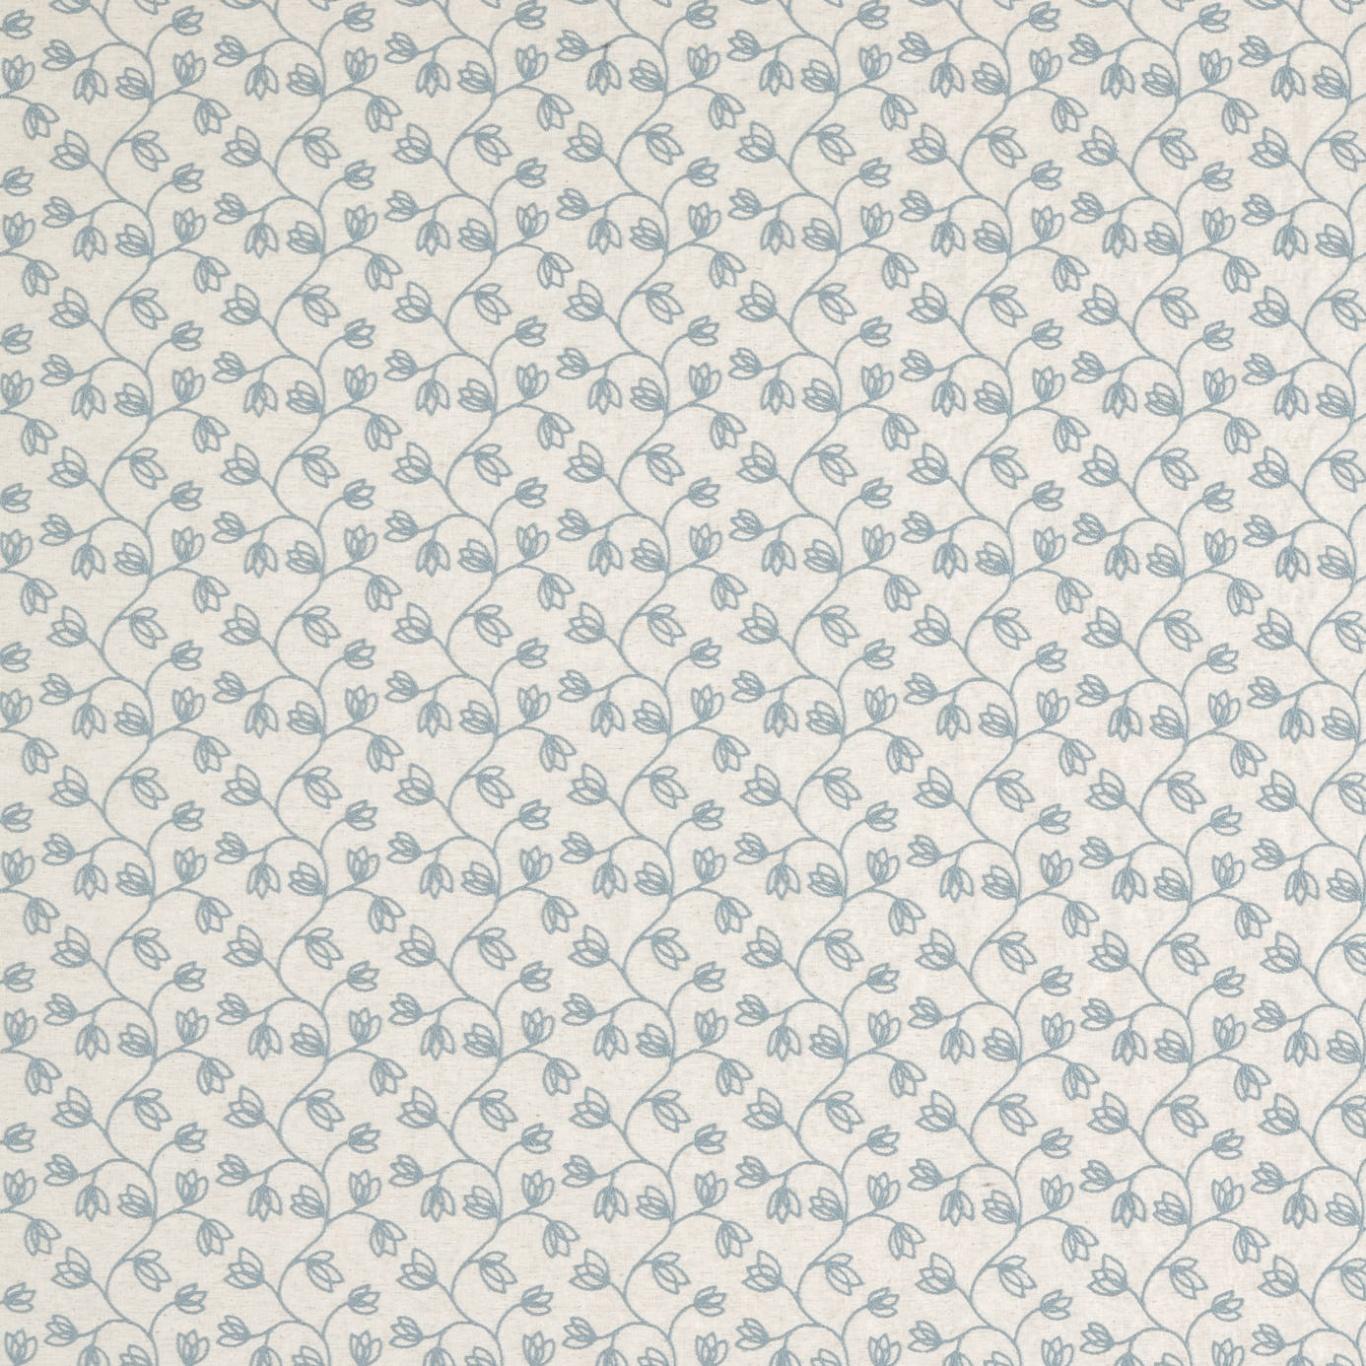 Image of Sanderson Ingleton Trail Teal Fabric 236277